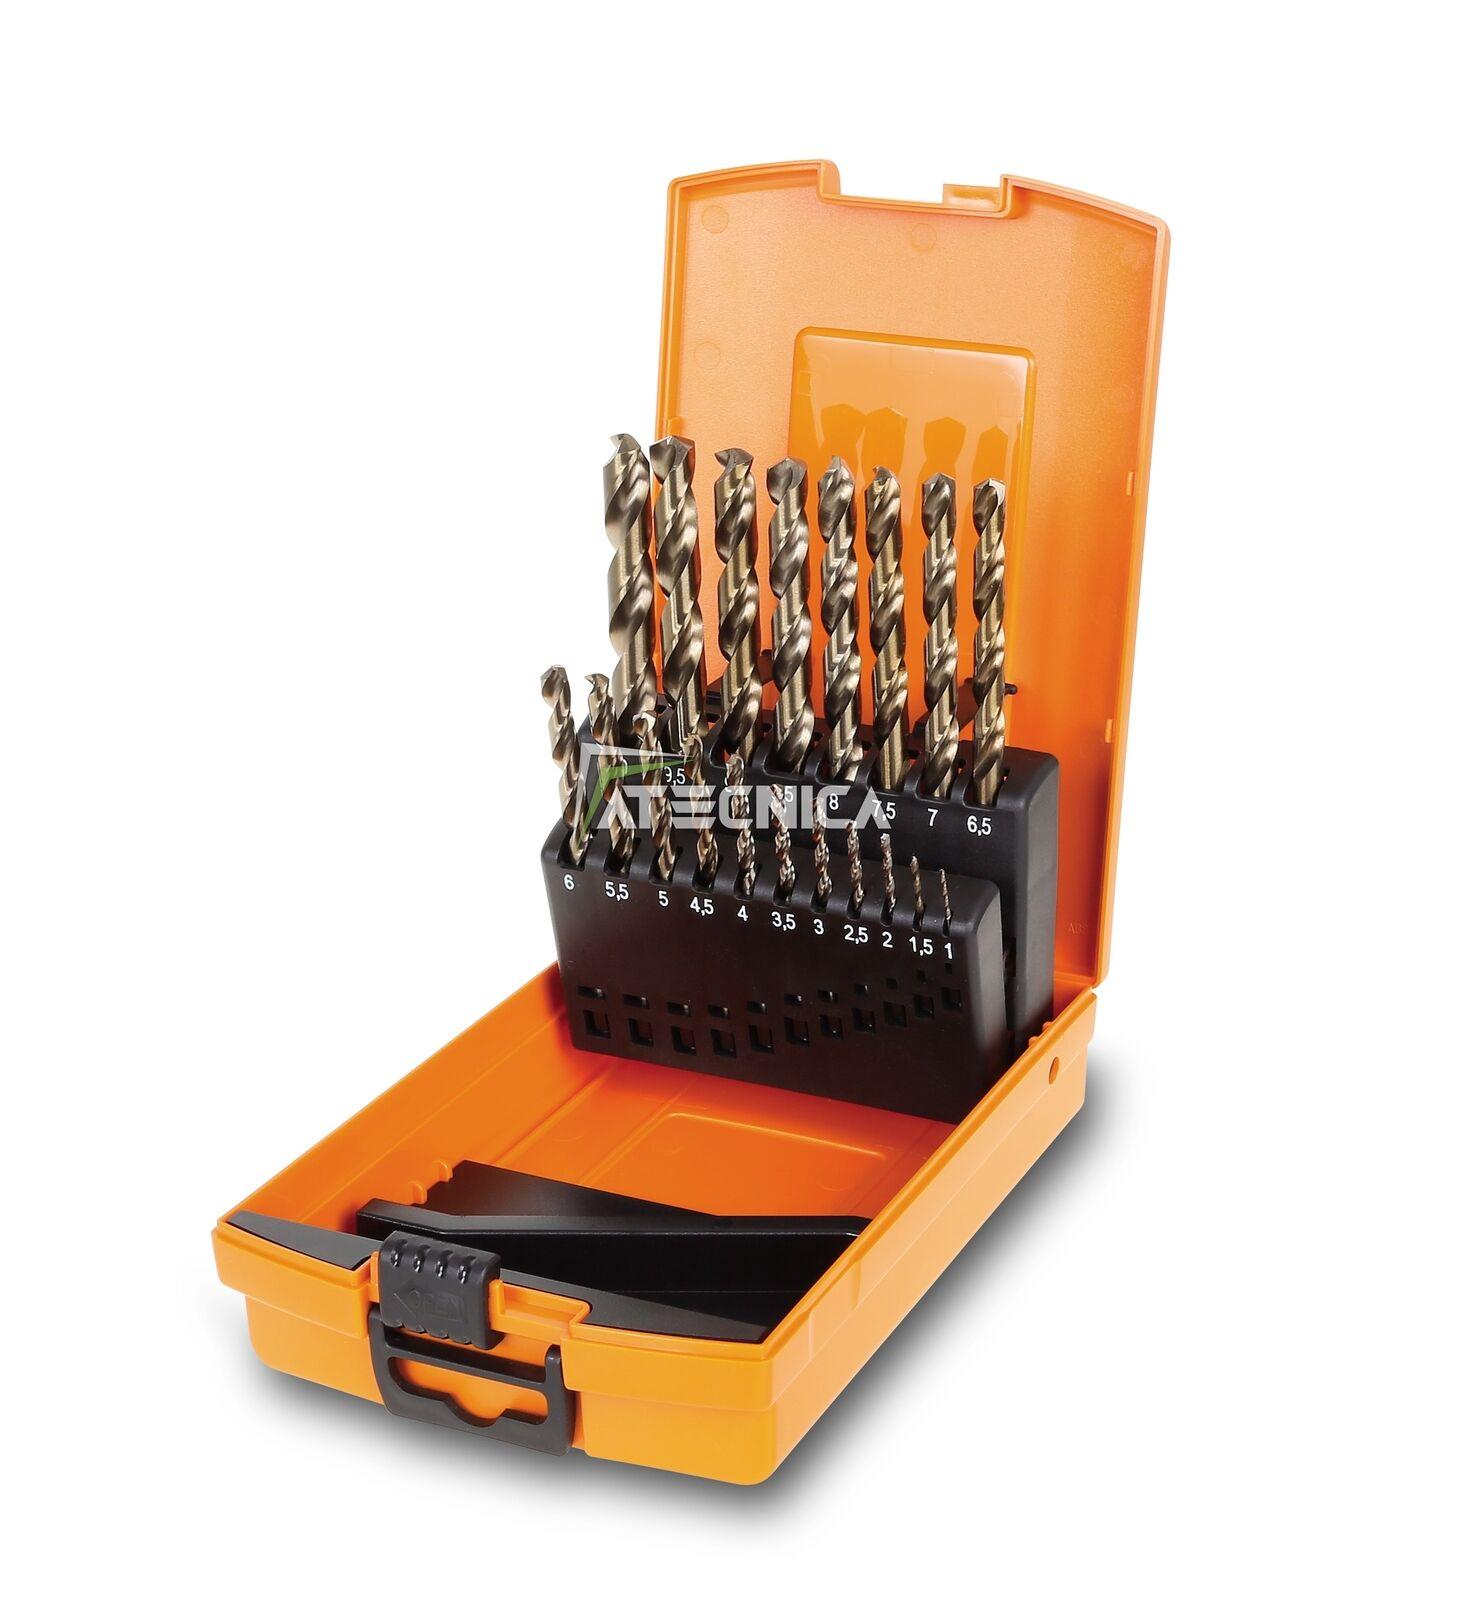 Tipps für Bohrer Beta Tools 415CO/SP19A set 19 Tipps elic. ø 1÷10 Beta 415